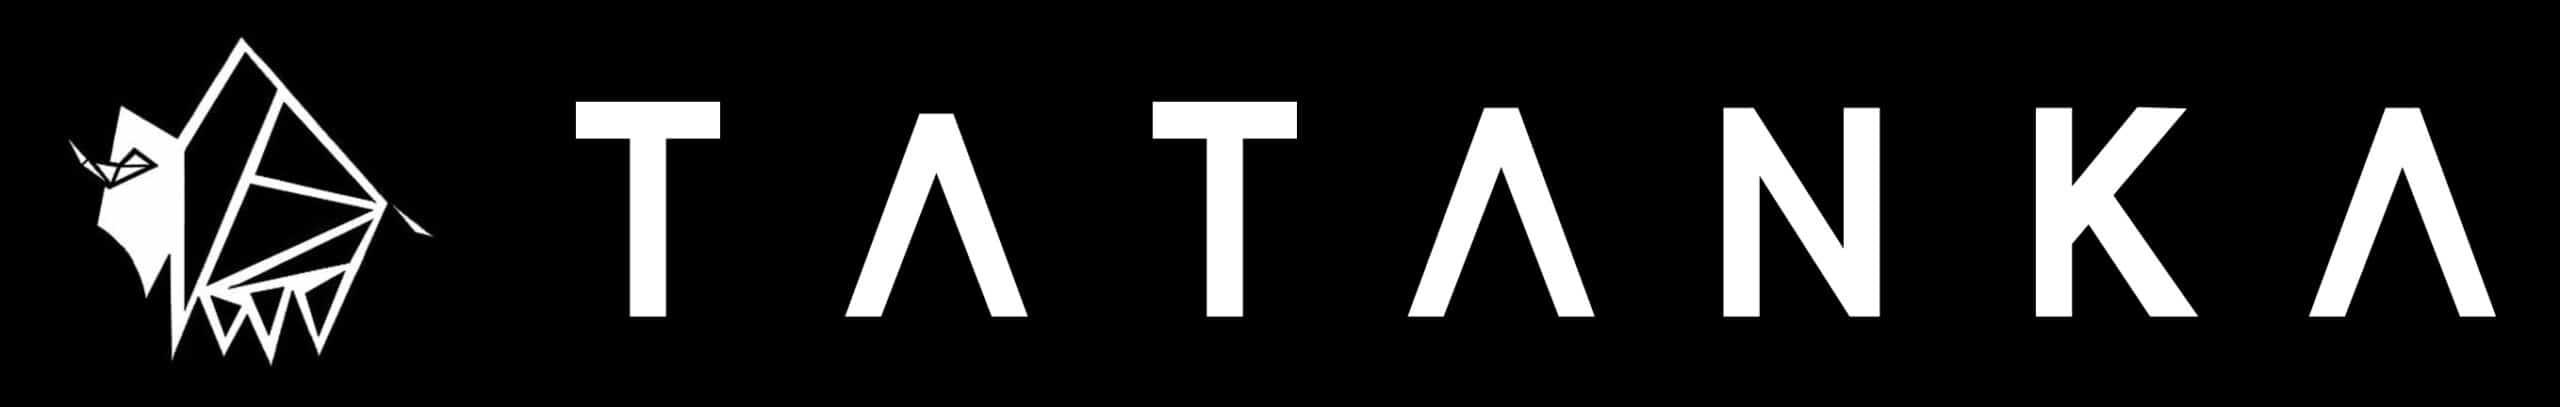 Tatanka Amsterdam Webshop